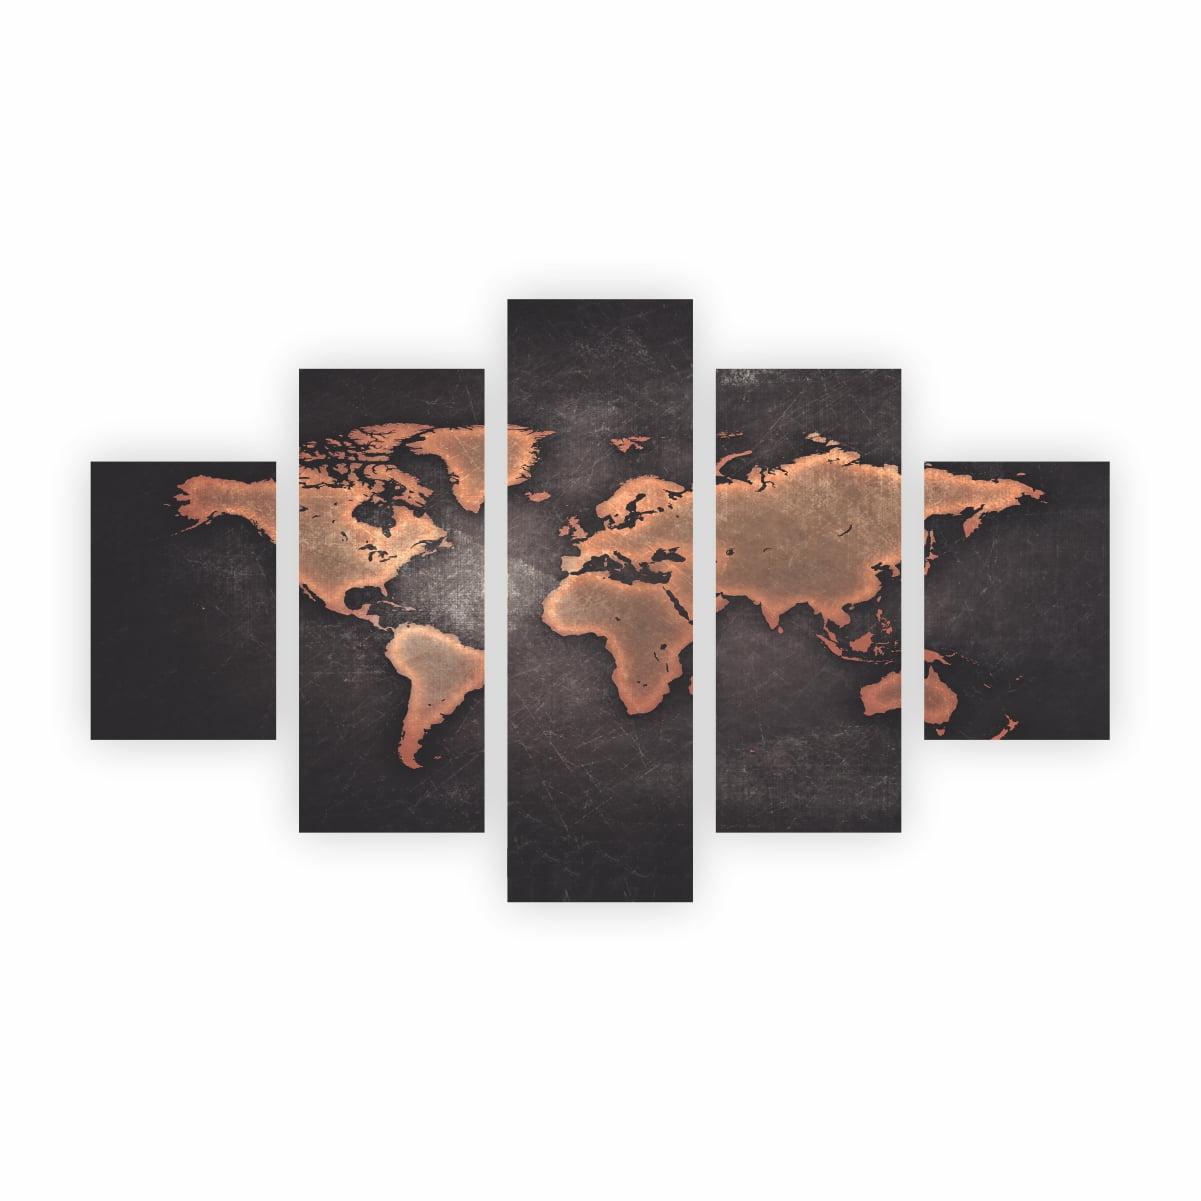 Quadro Mapa Mundi Decorativo em Tela Canvas